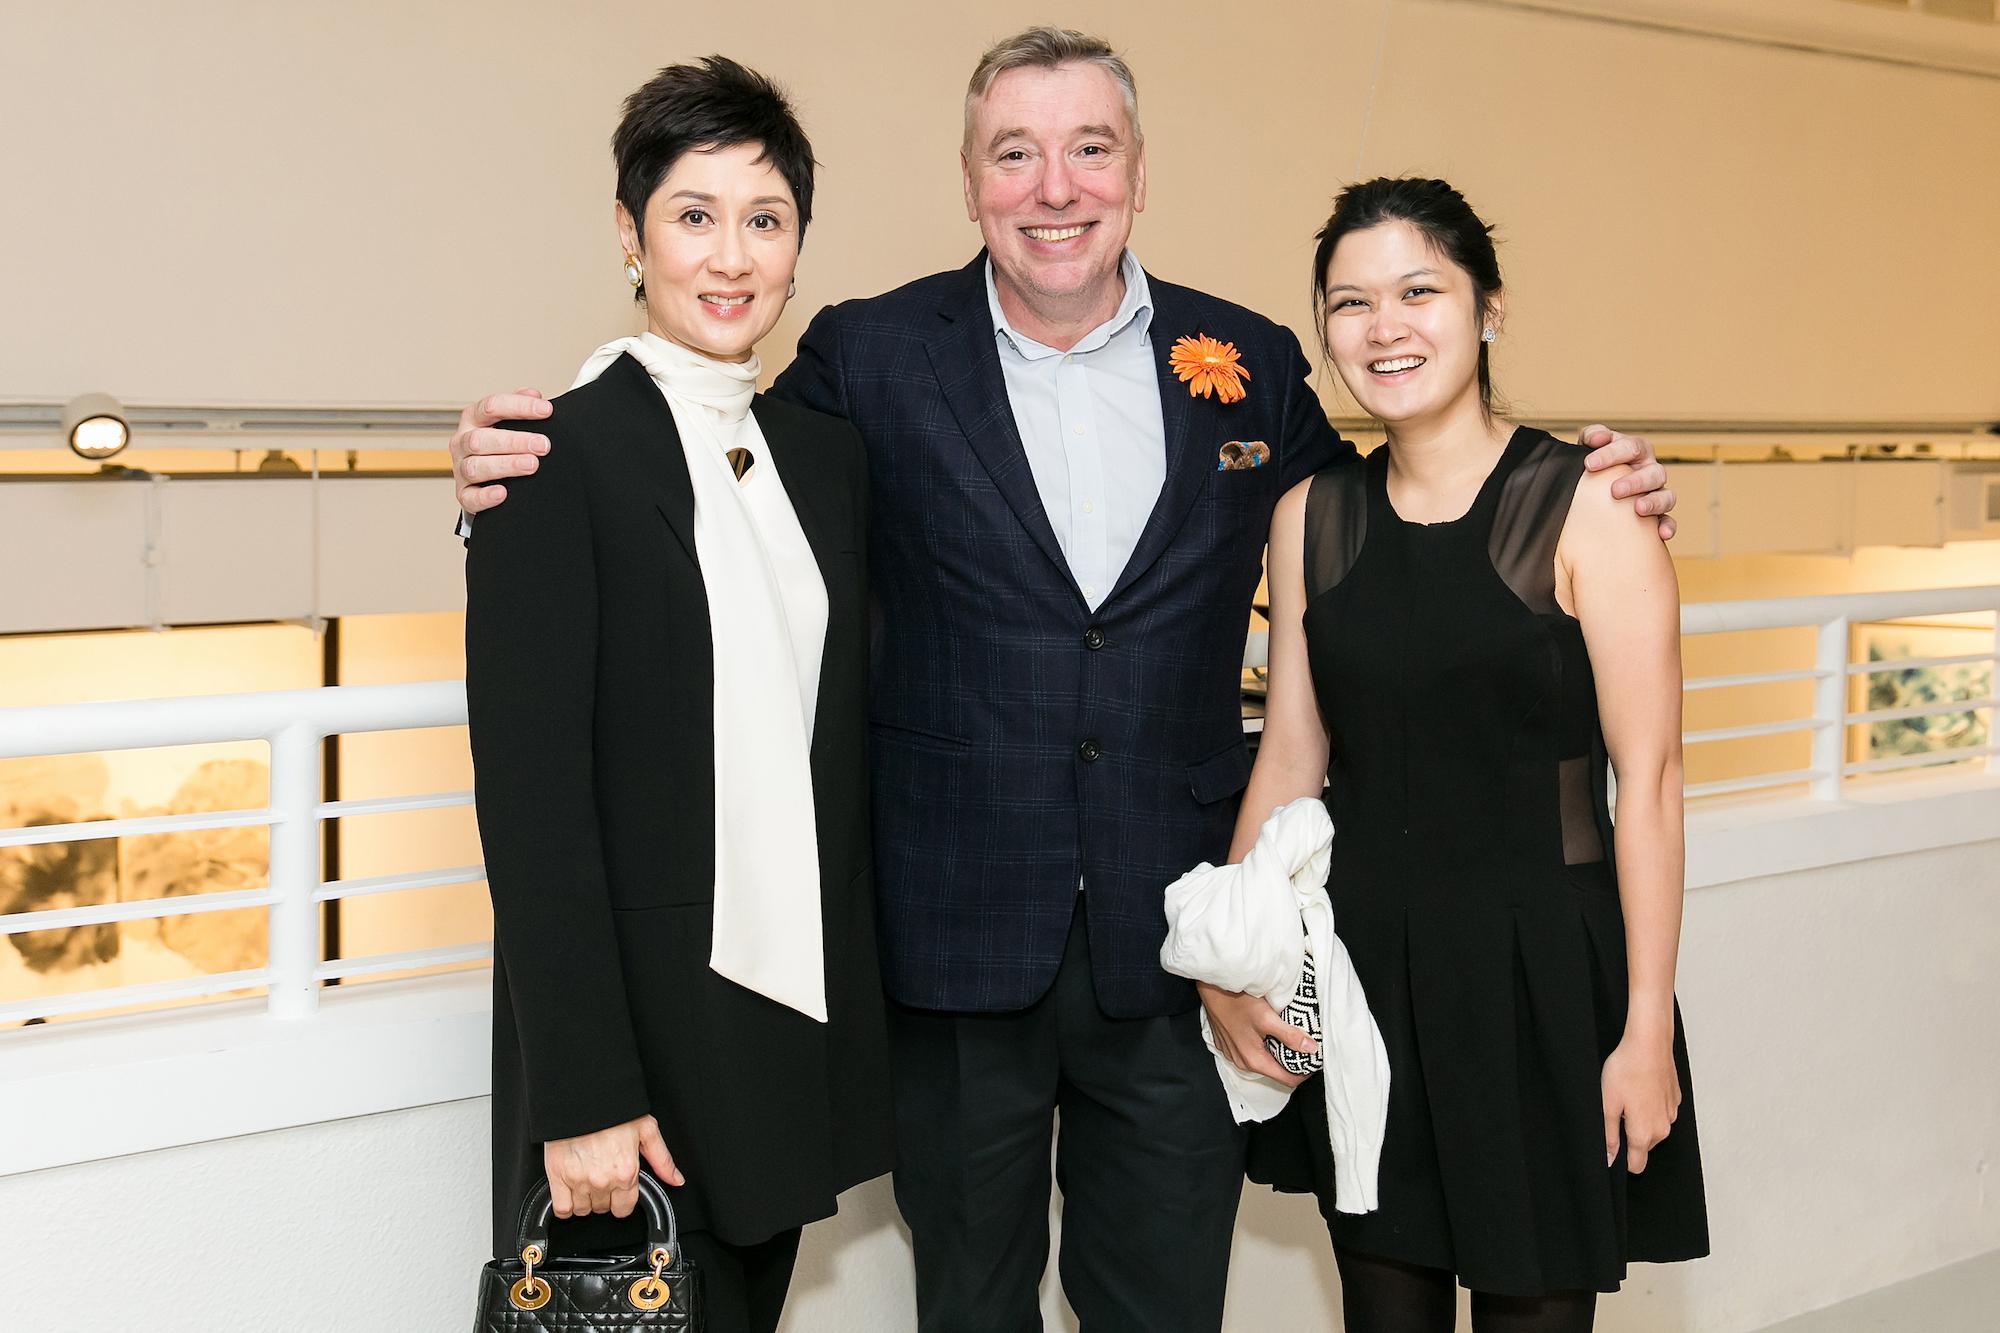 Michelle Ong, Mark Peaker, Jennifer Cheung